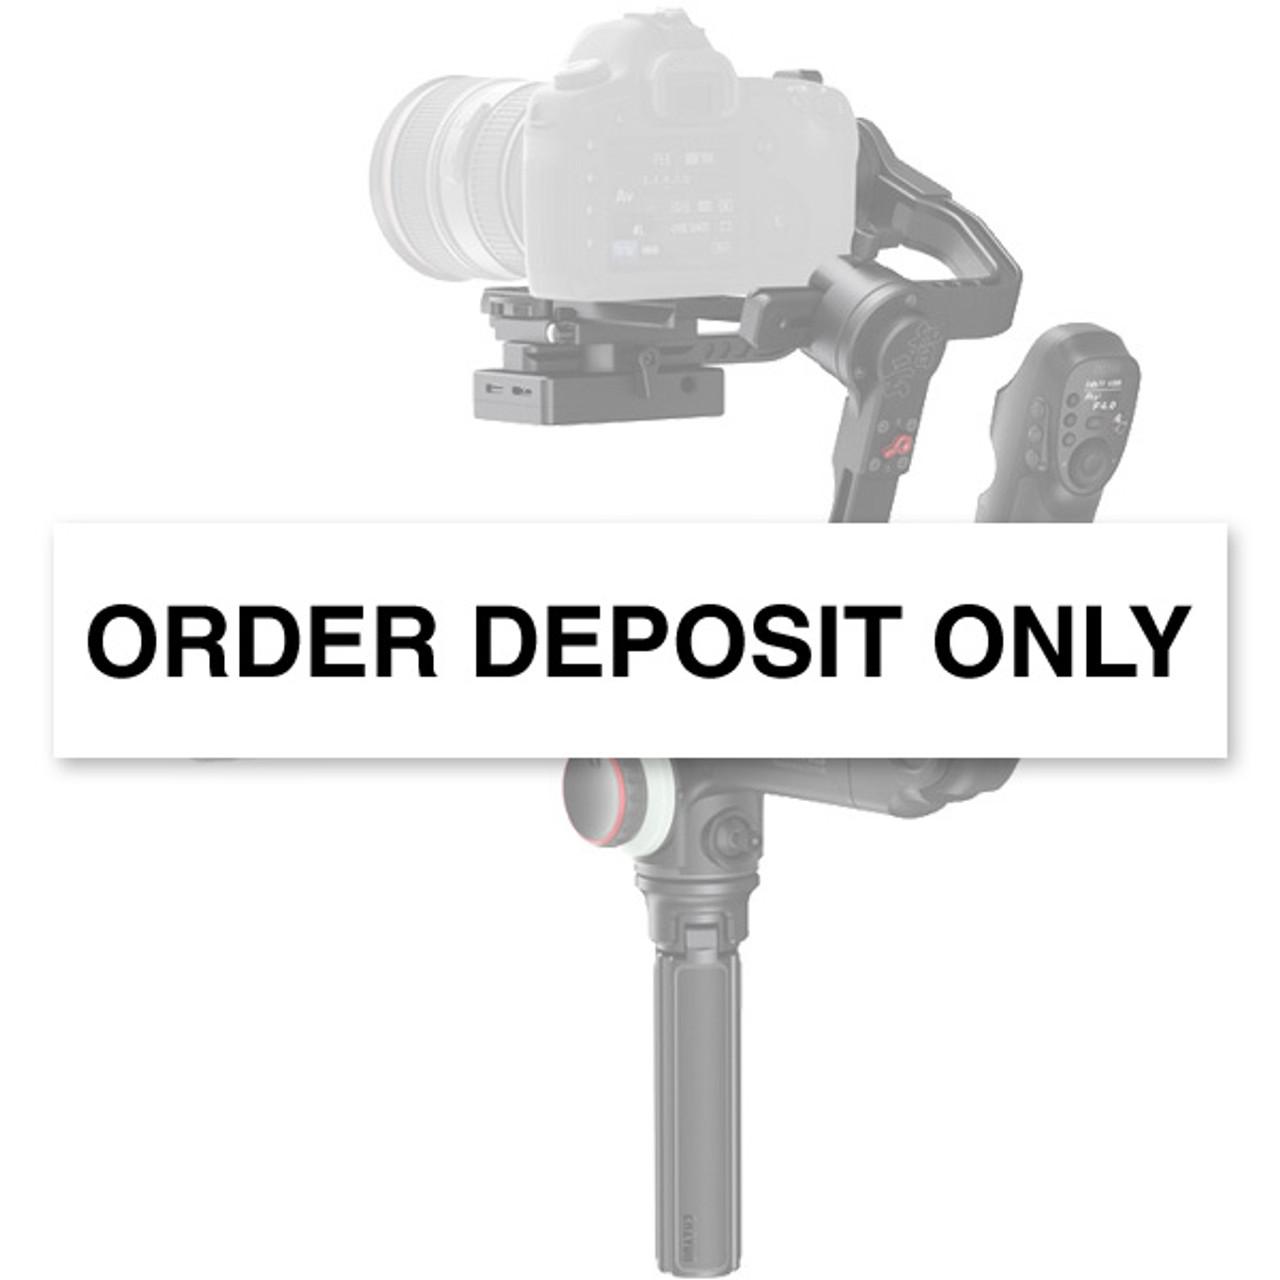 Zhiyun Crane 3 Lab Pre-Order Deposit